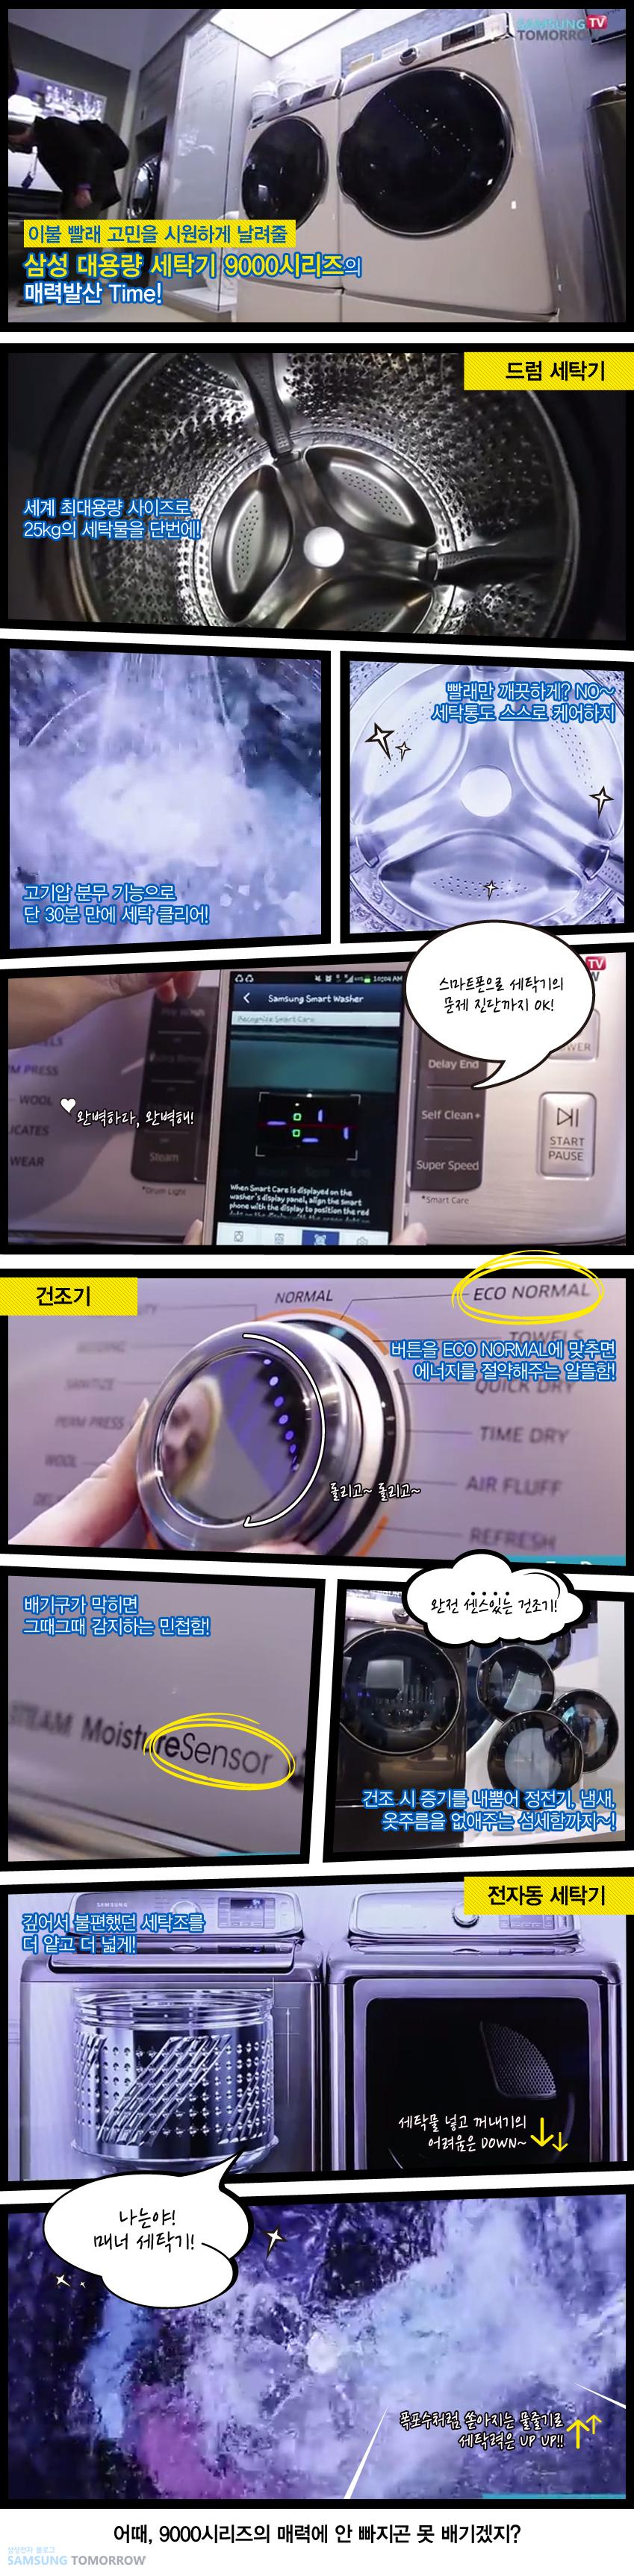 CES 2014 핸즈온 영상을 통해 소개된 삼성 대용량 세탁기 9000시리즈